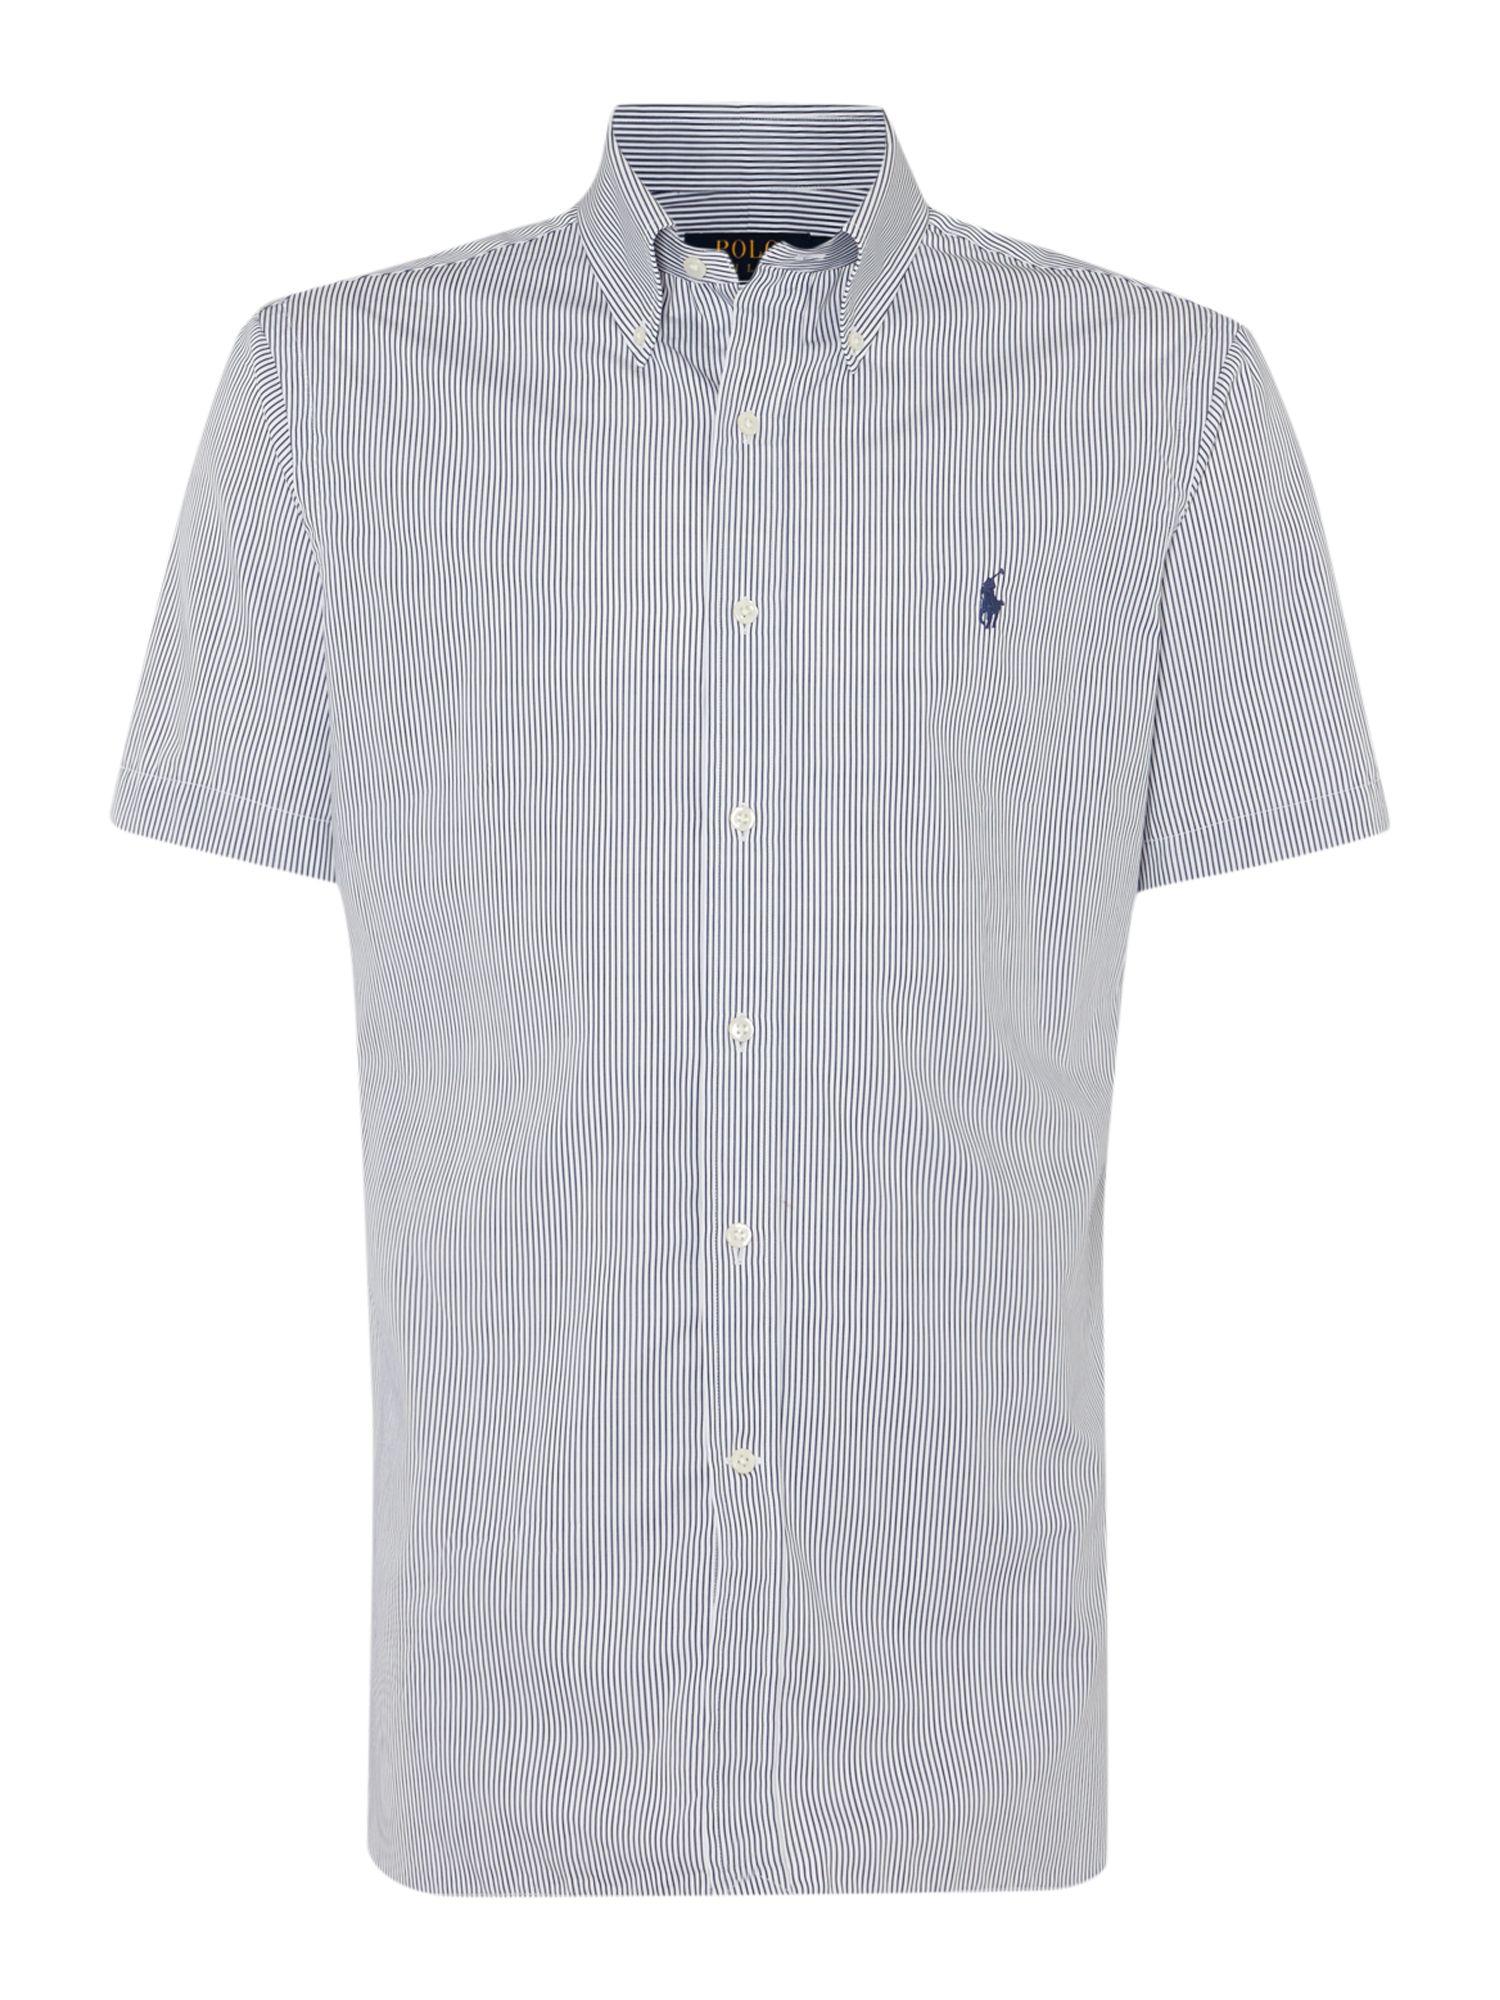 Polo Ralph Lauren Short Sleeve Dress Shirt In Blue For Men